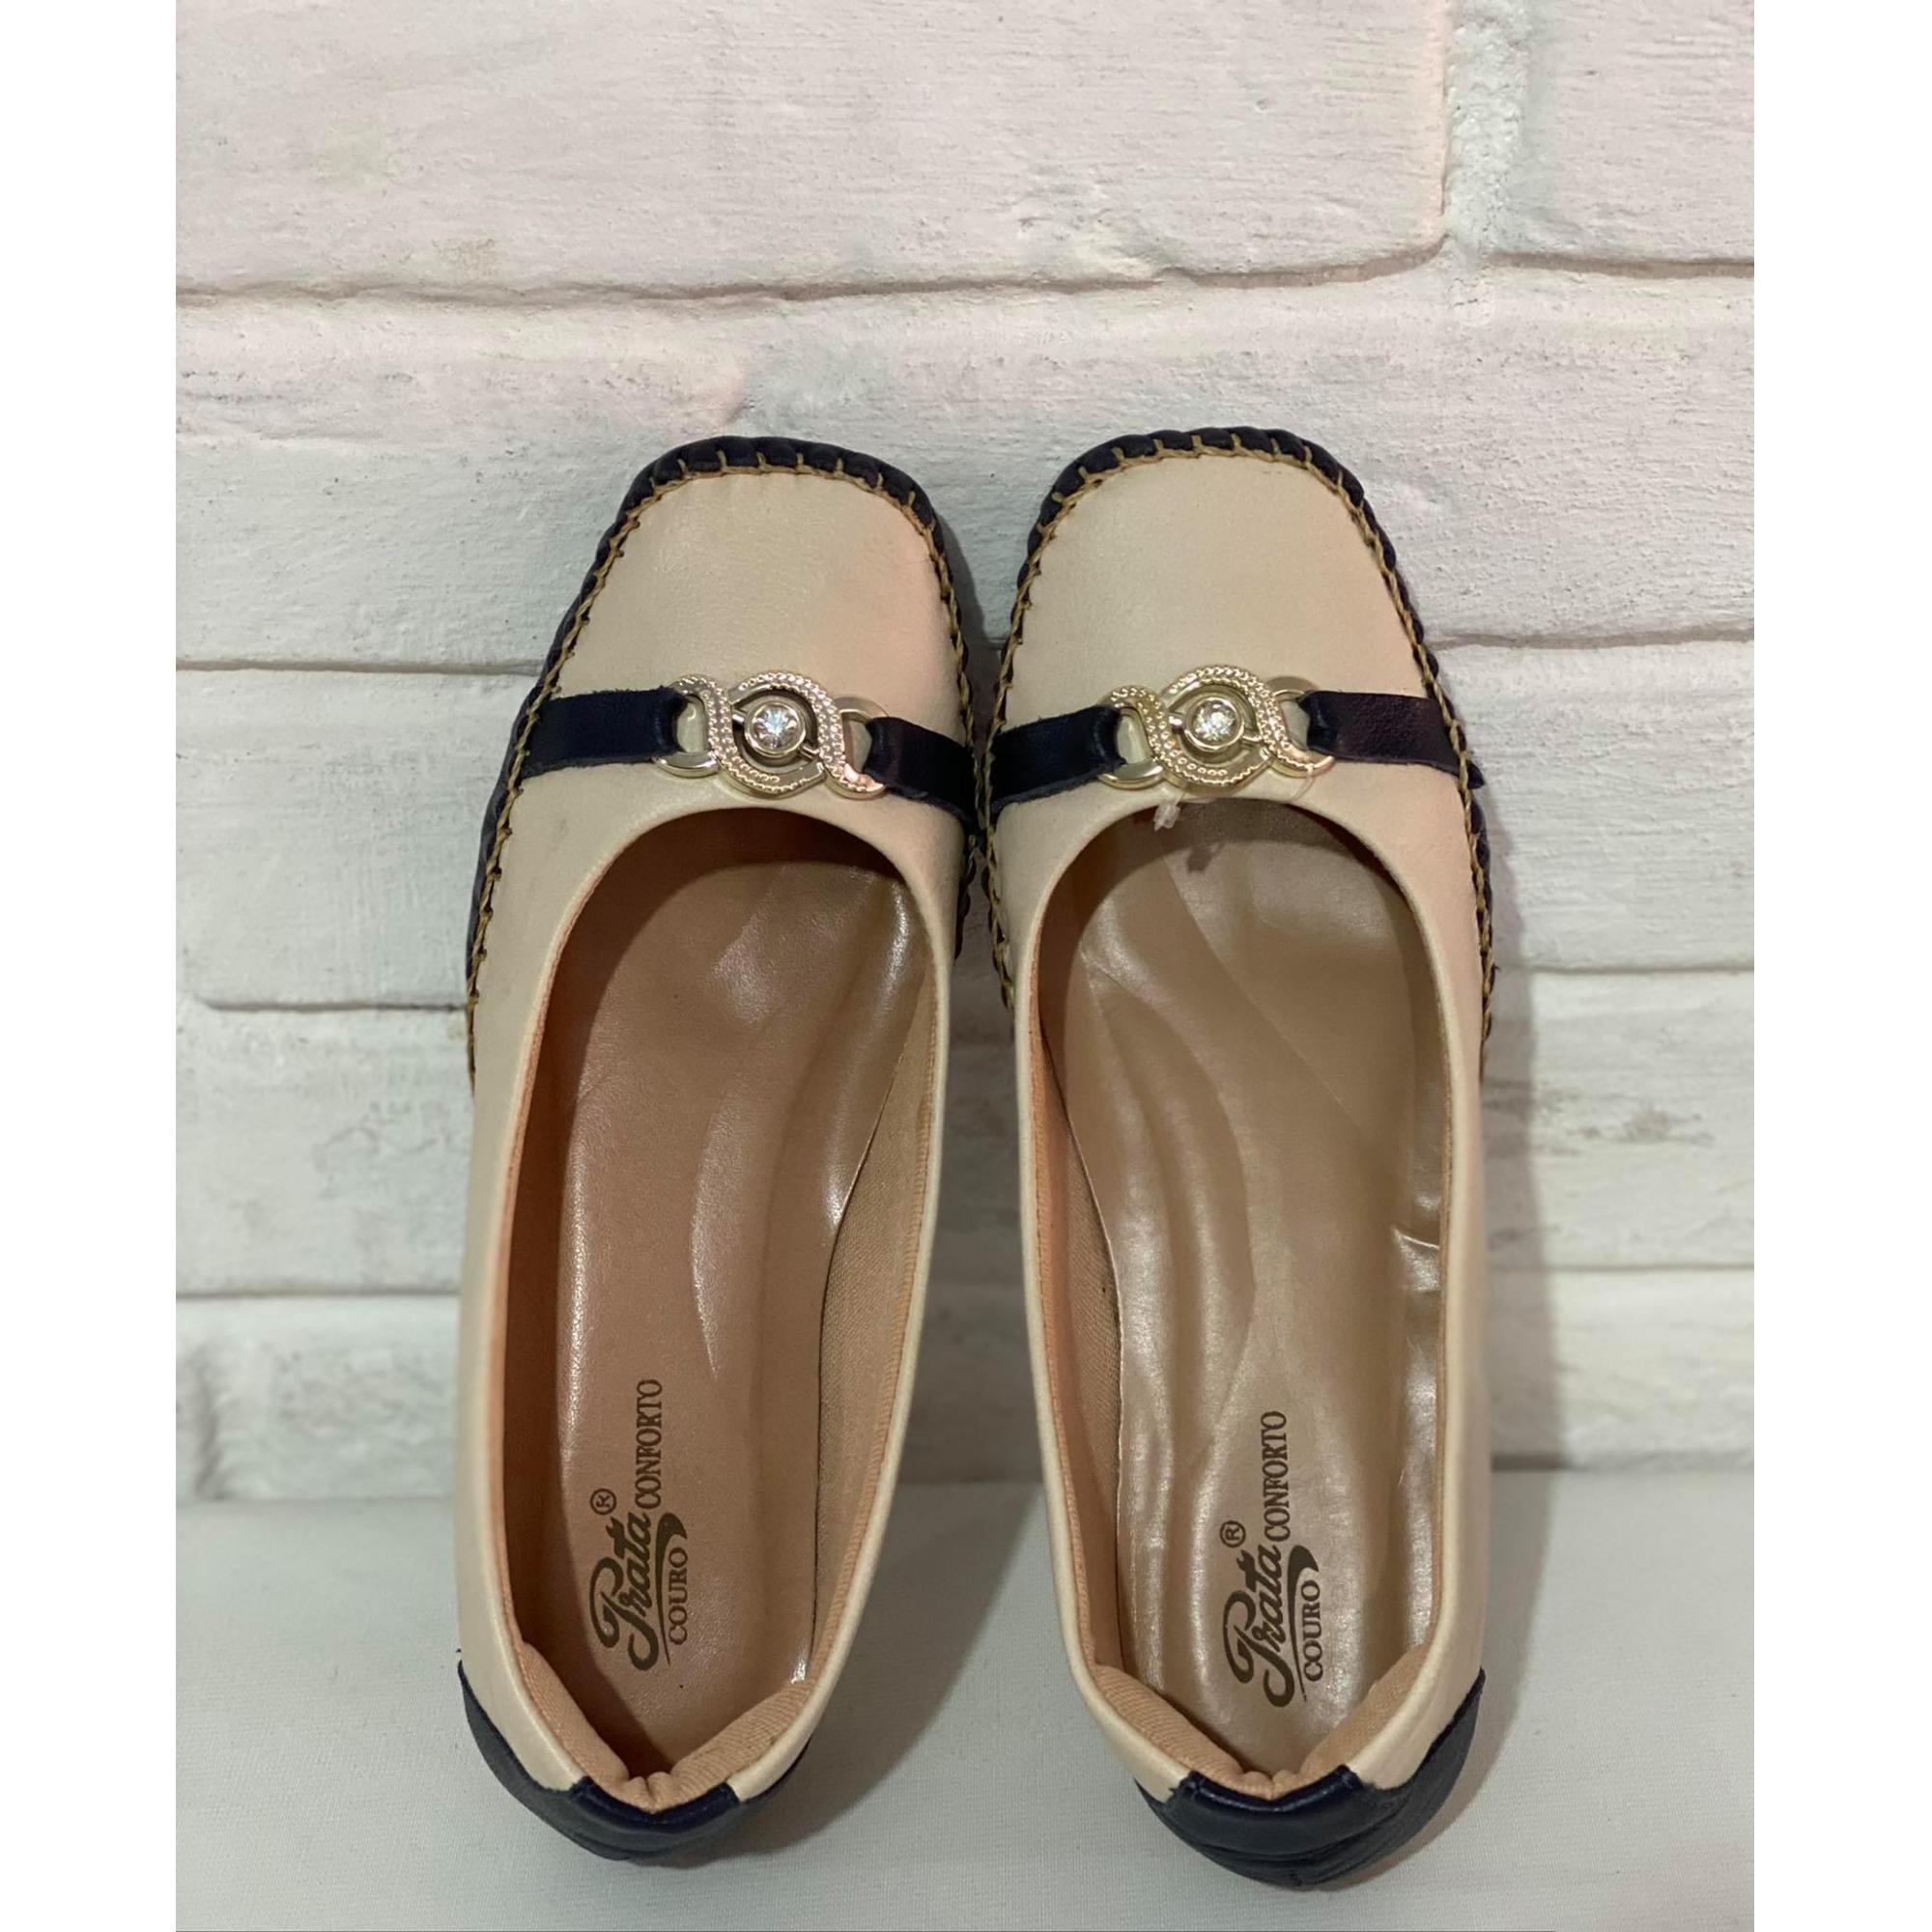 Mule Feminino Prata Couro Confort 1011080 Marfim/Marinho